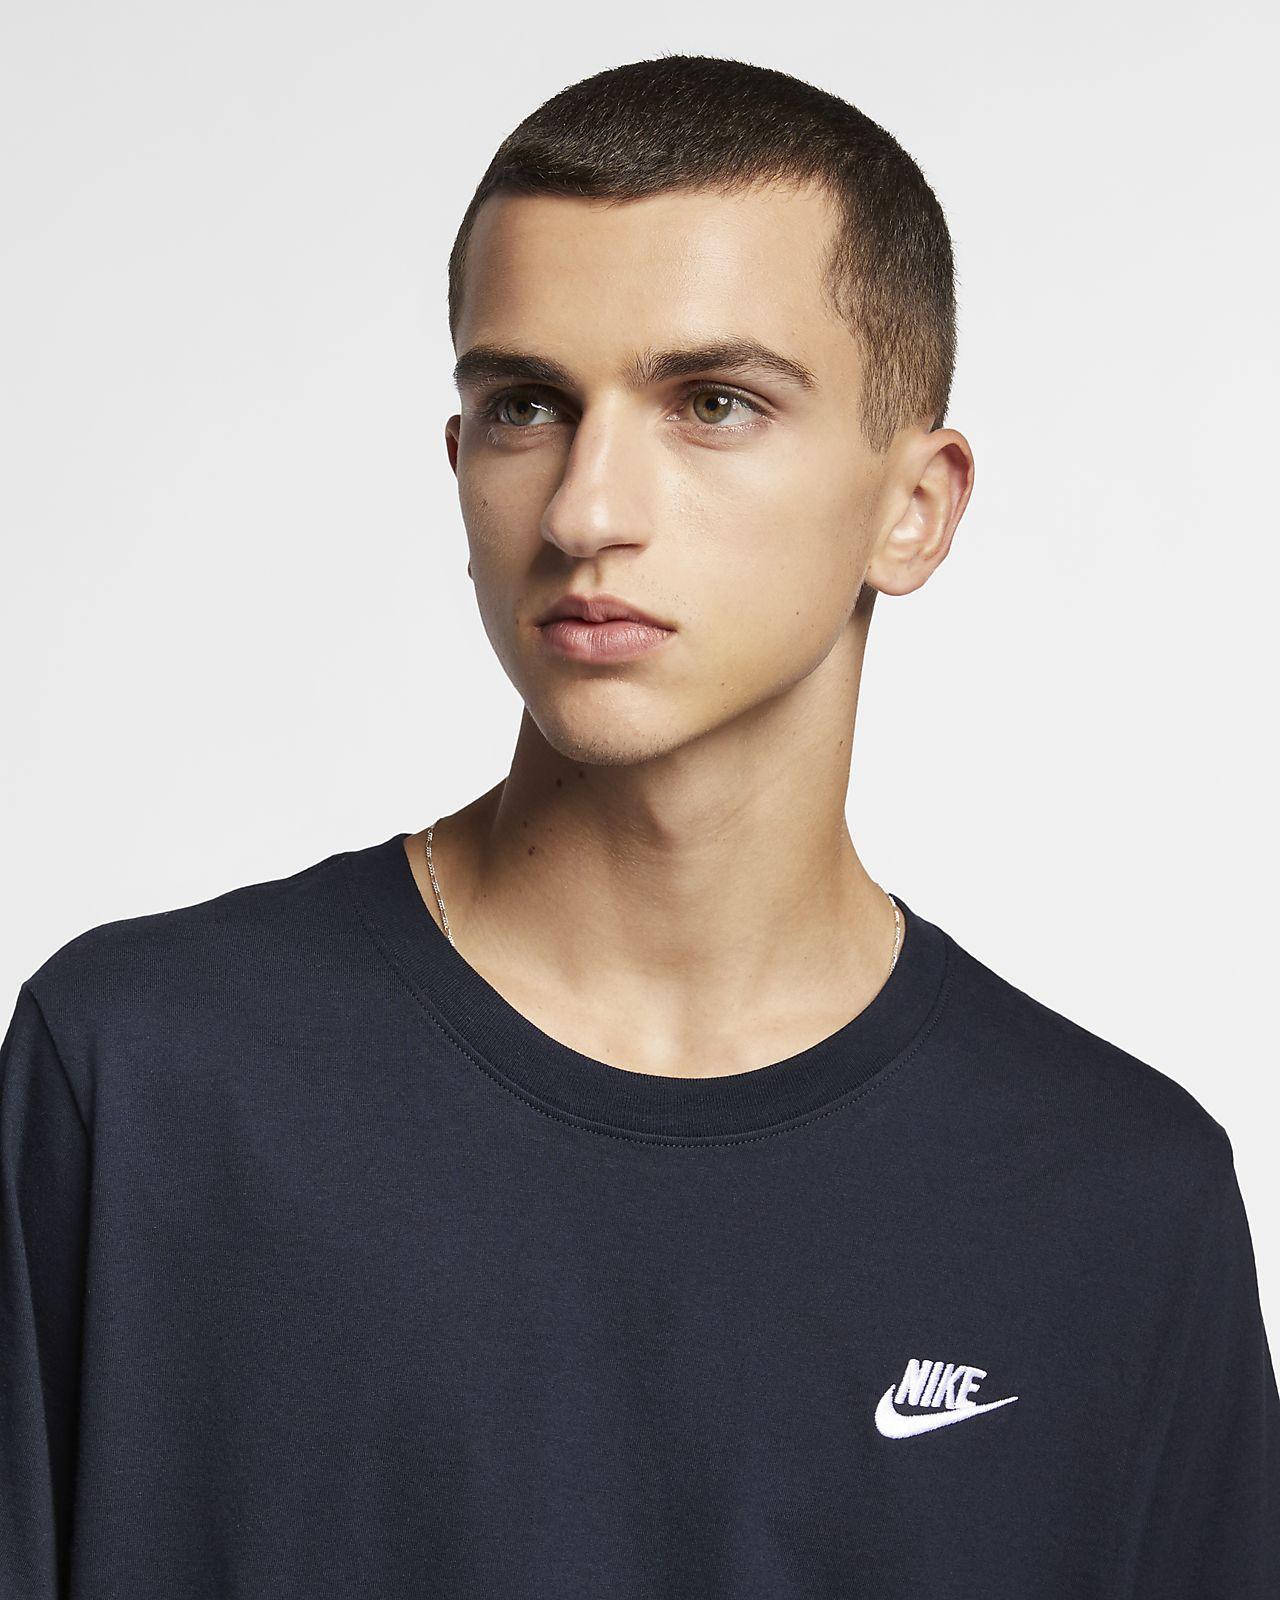 ebf255f32 Nike Sportswear Club Men's T-Shirt. Nike.com DK